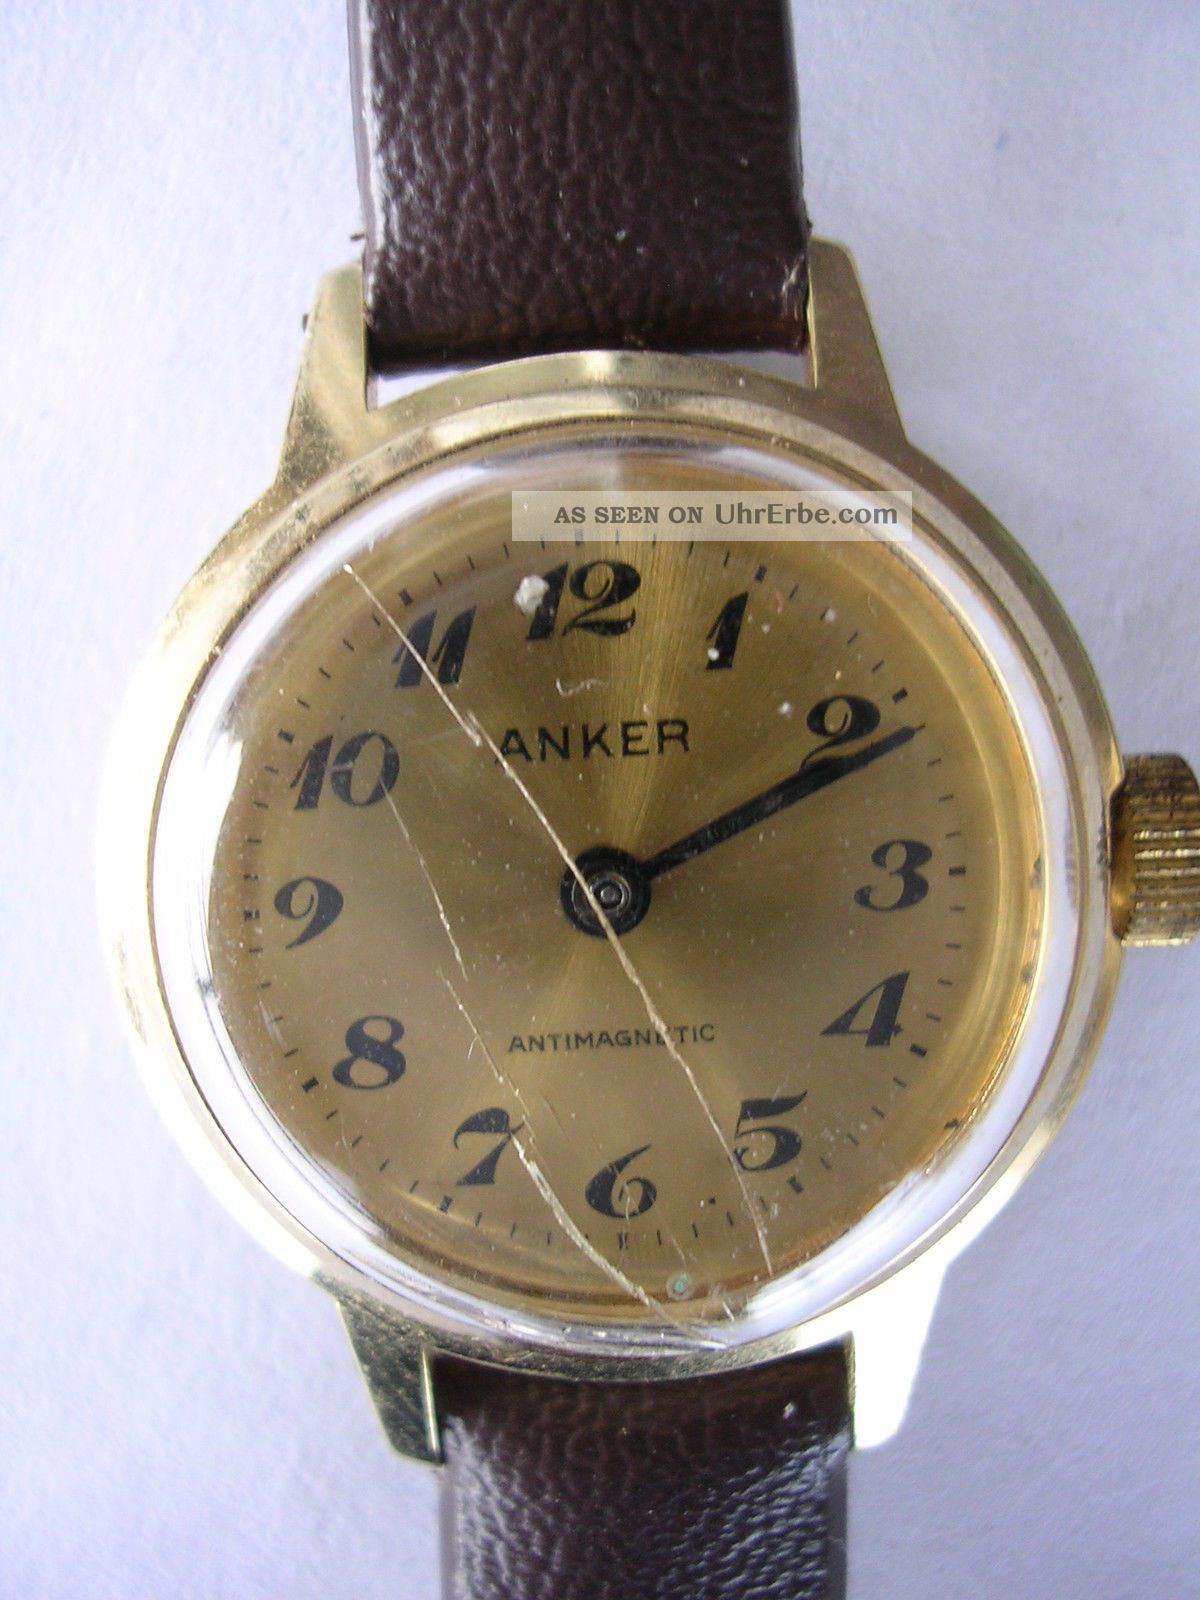 Für Sammler Handaufzug Vintage Damenruhr Anker Dau Aus Nachlass Armbanduhren Bild